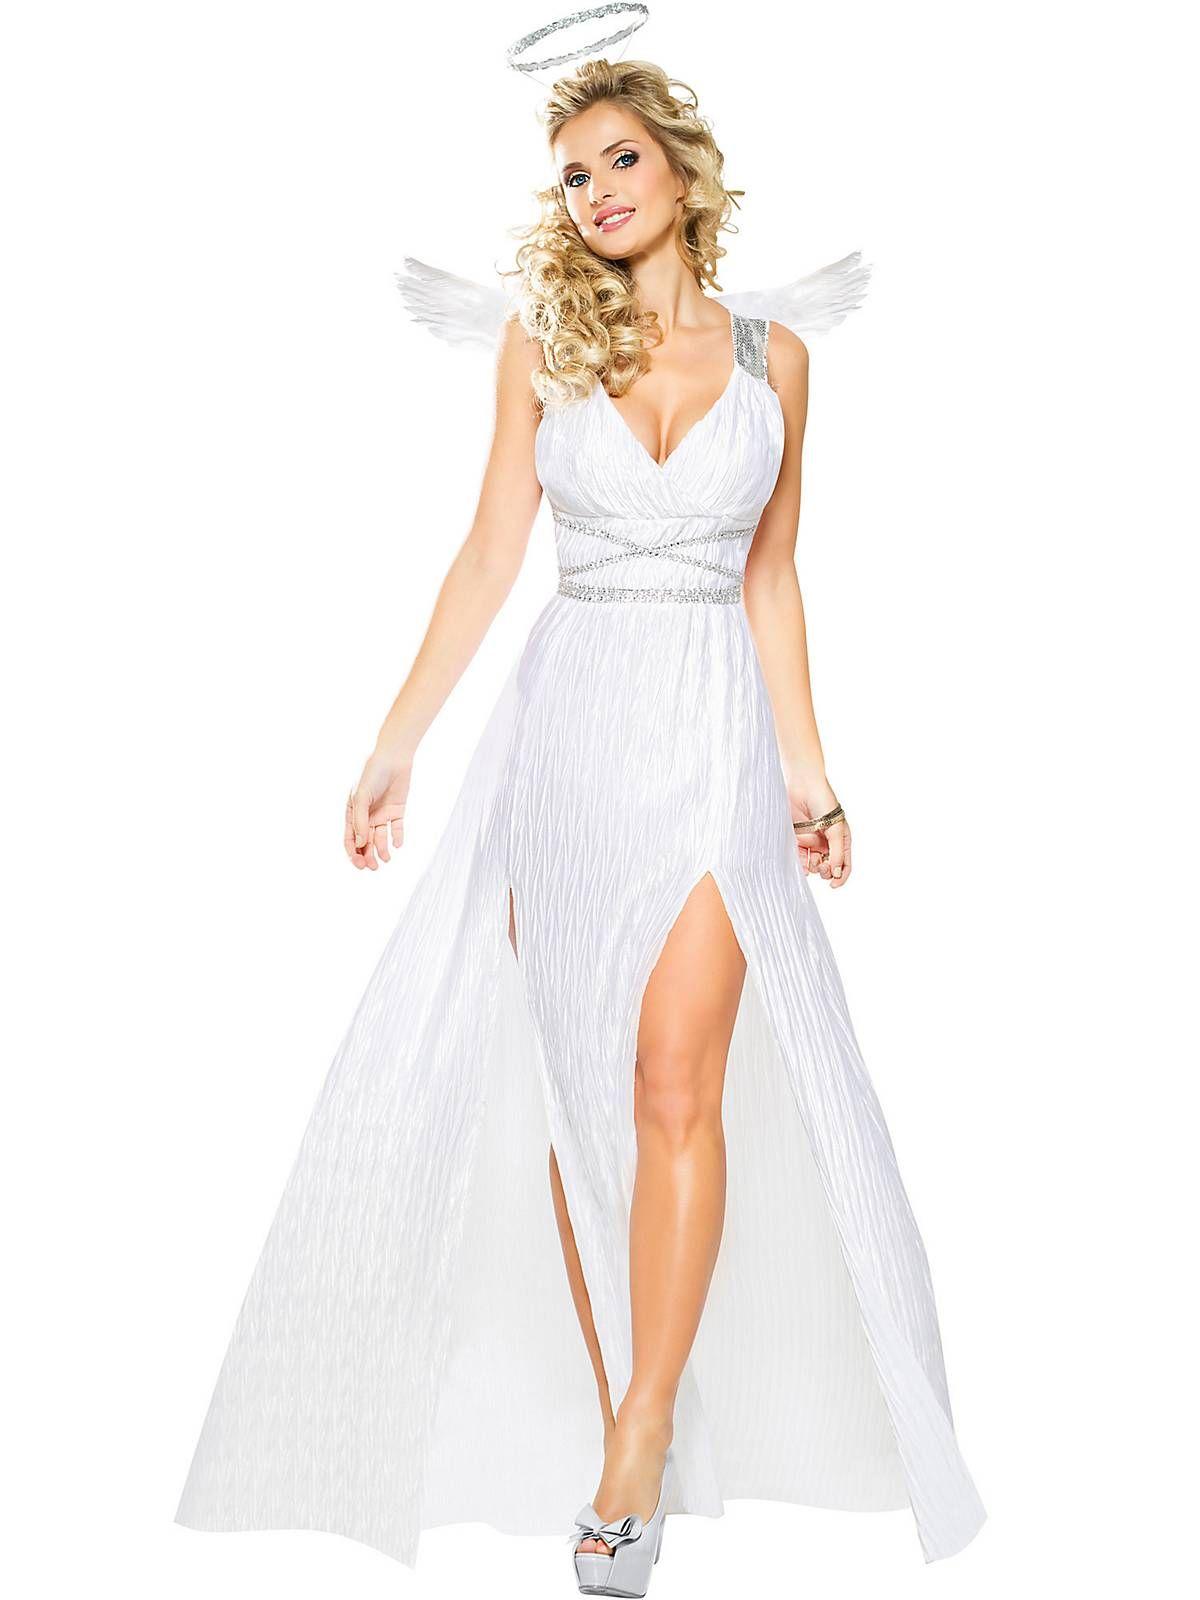 ladies women/'s large white faux fur chiffon Christmas Santa Con angel costume costumes dress